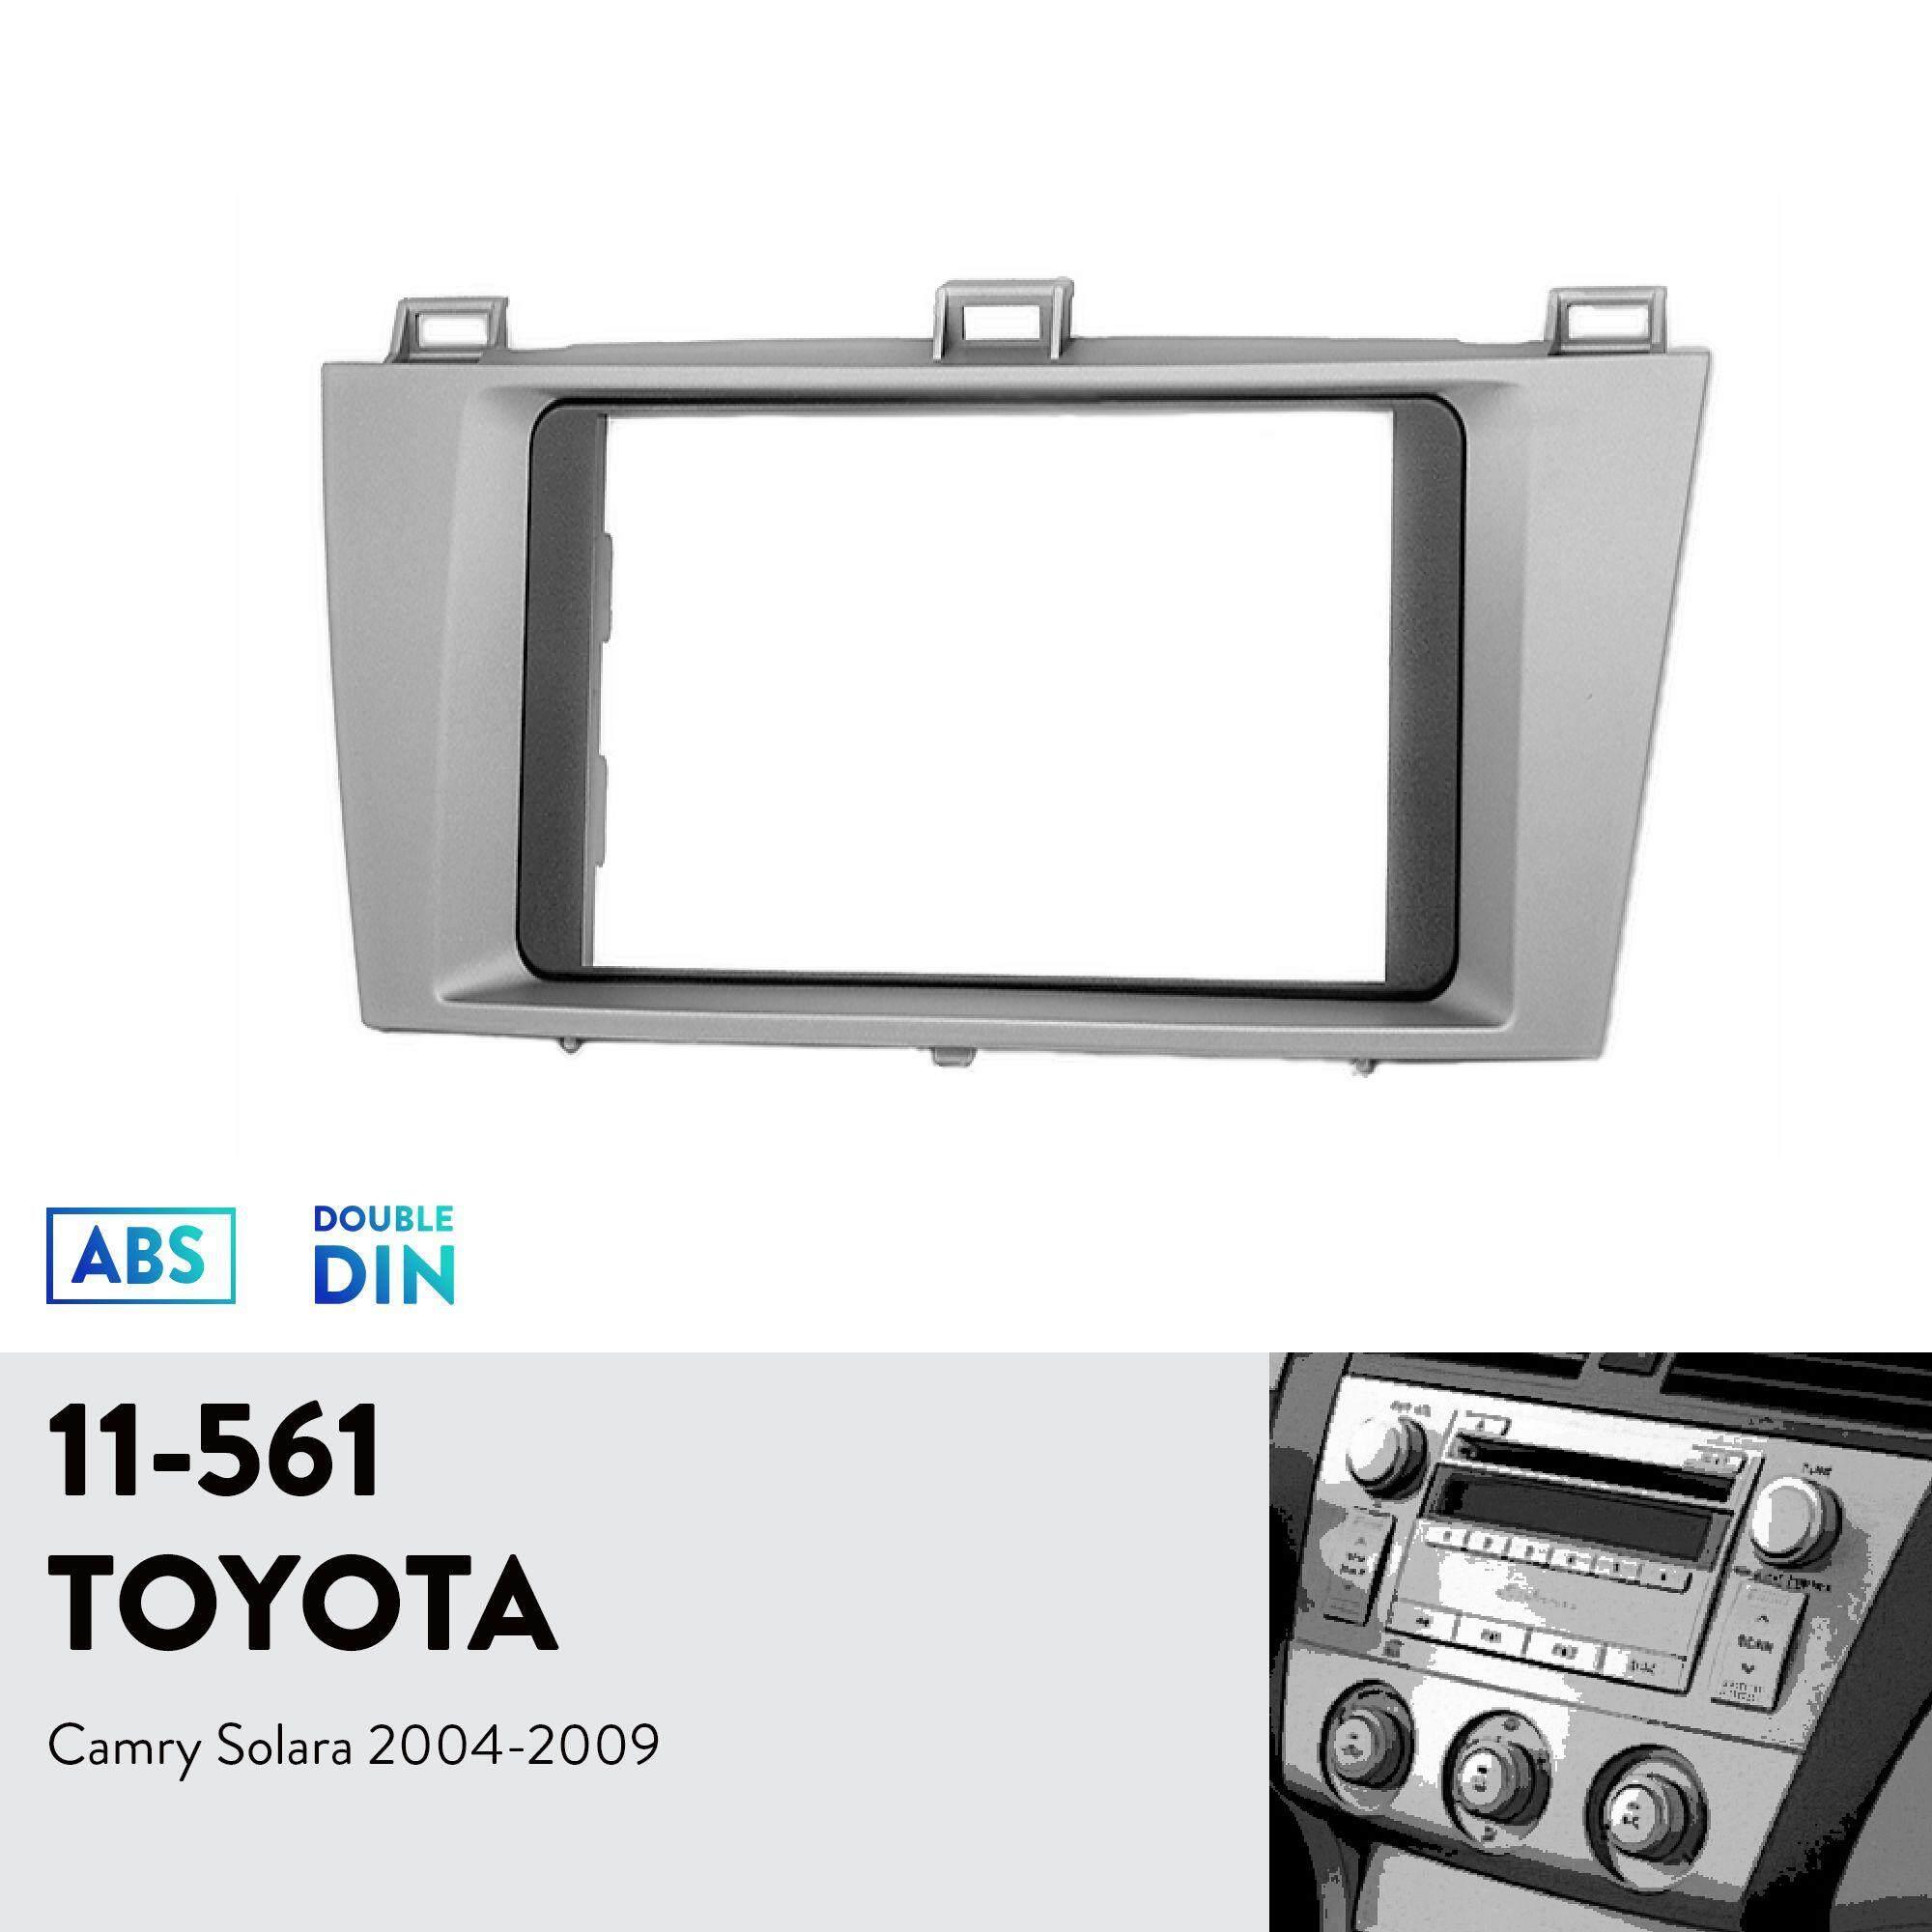 Ugar 11-561 Trim Fasia Radio Mobil Instalasi Pemasangan Perangkat Untuk Toyota Camry Solara 2004-2009 By Ugar.